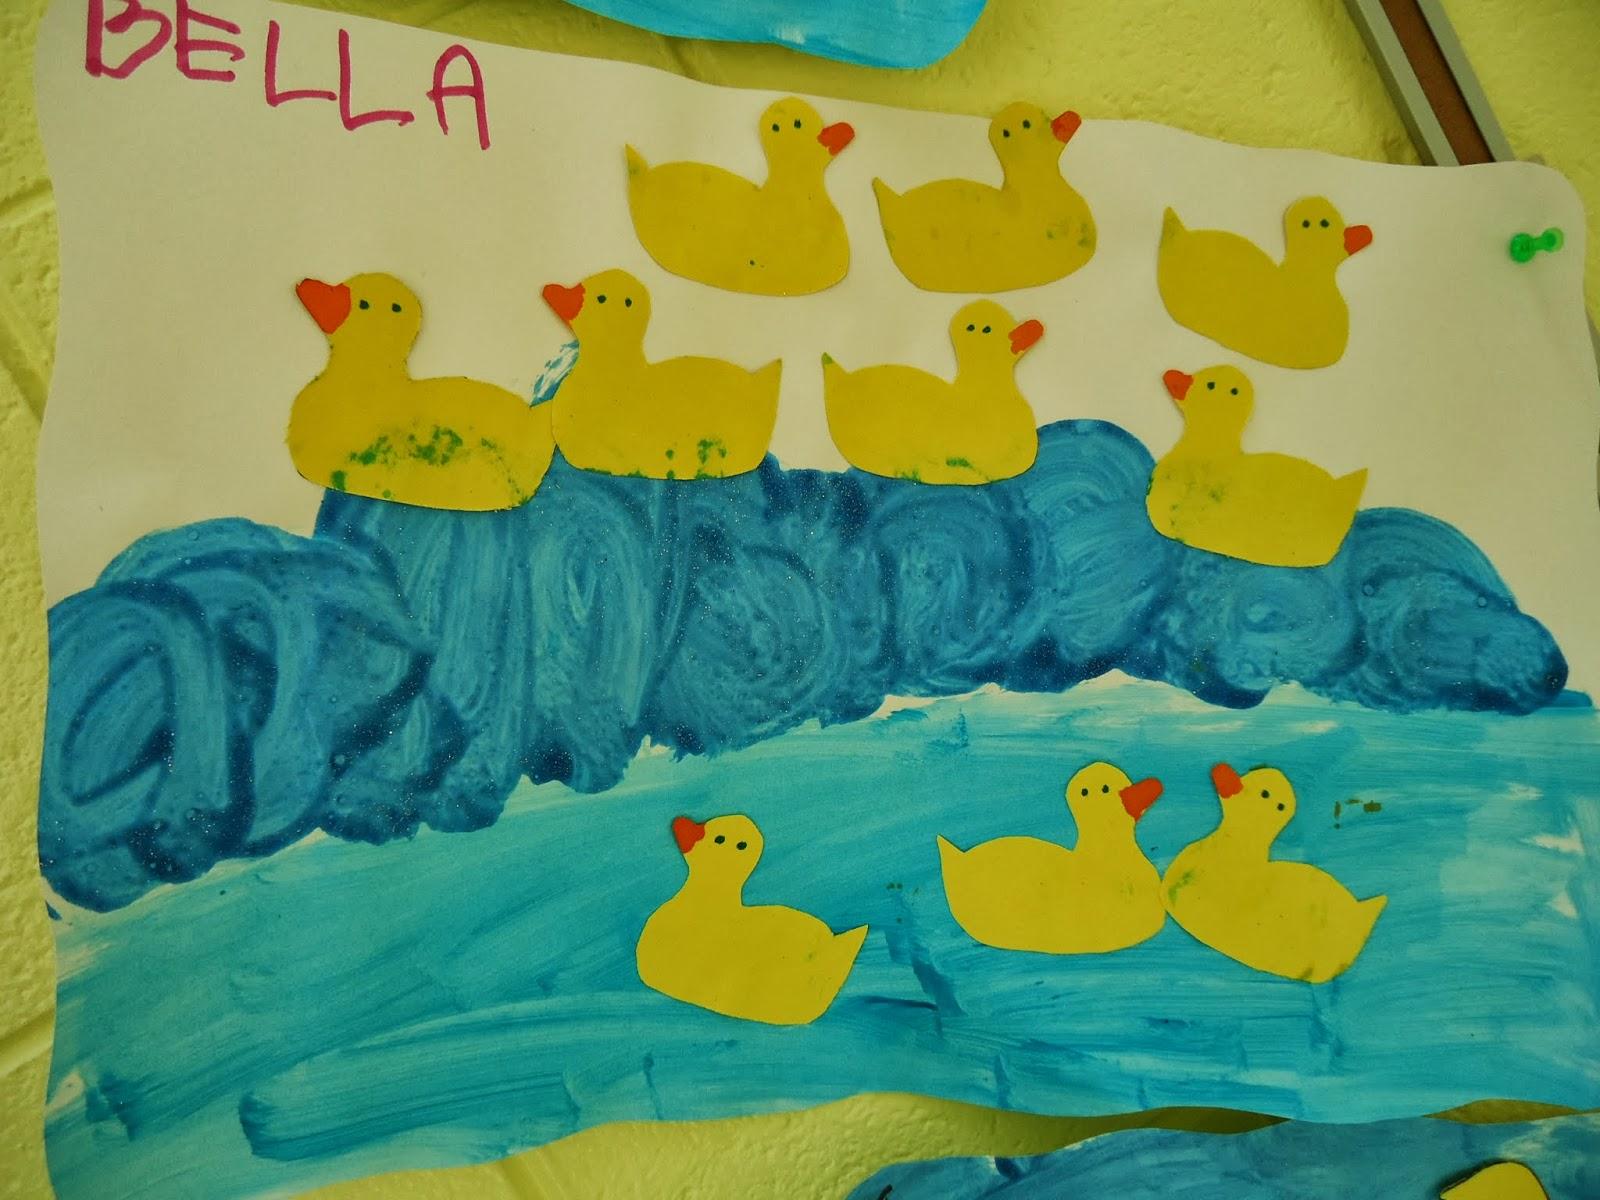 Trinity Preschool Mount Prospect Trinity Preschool Activities For Friday November 15